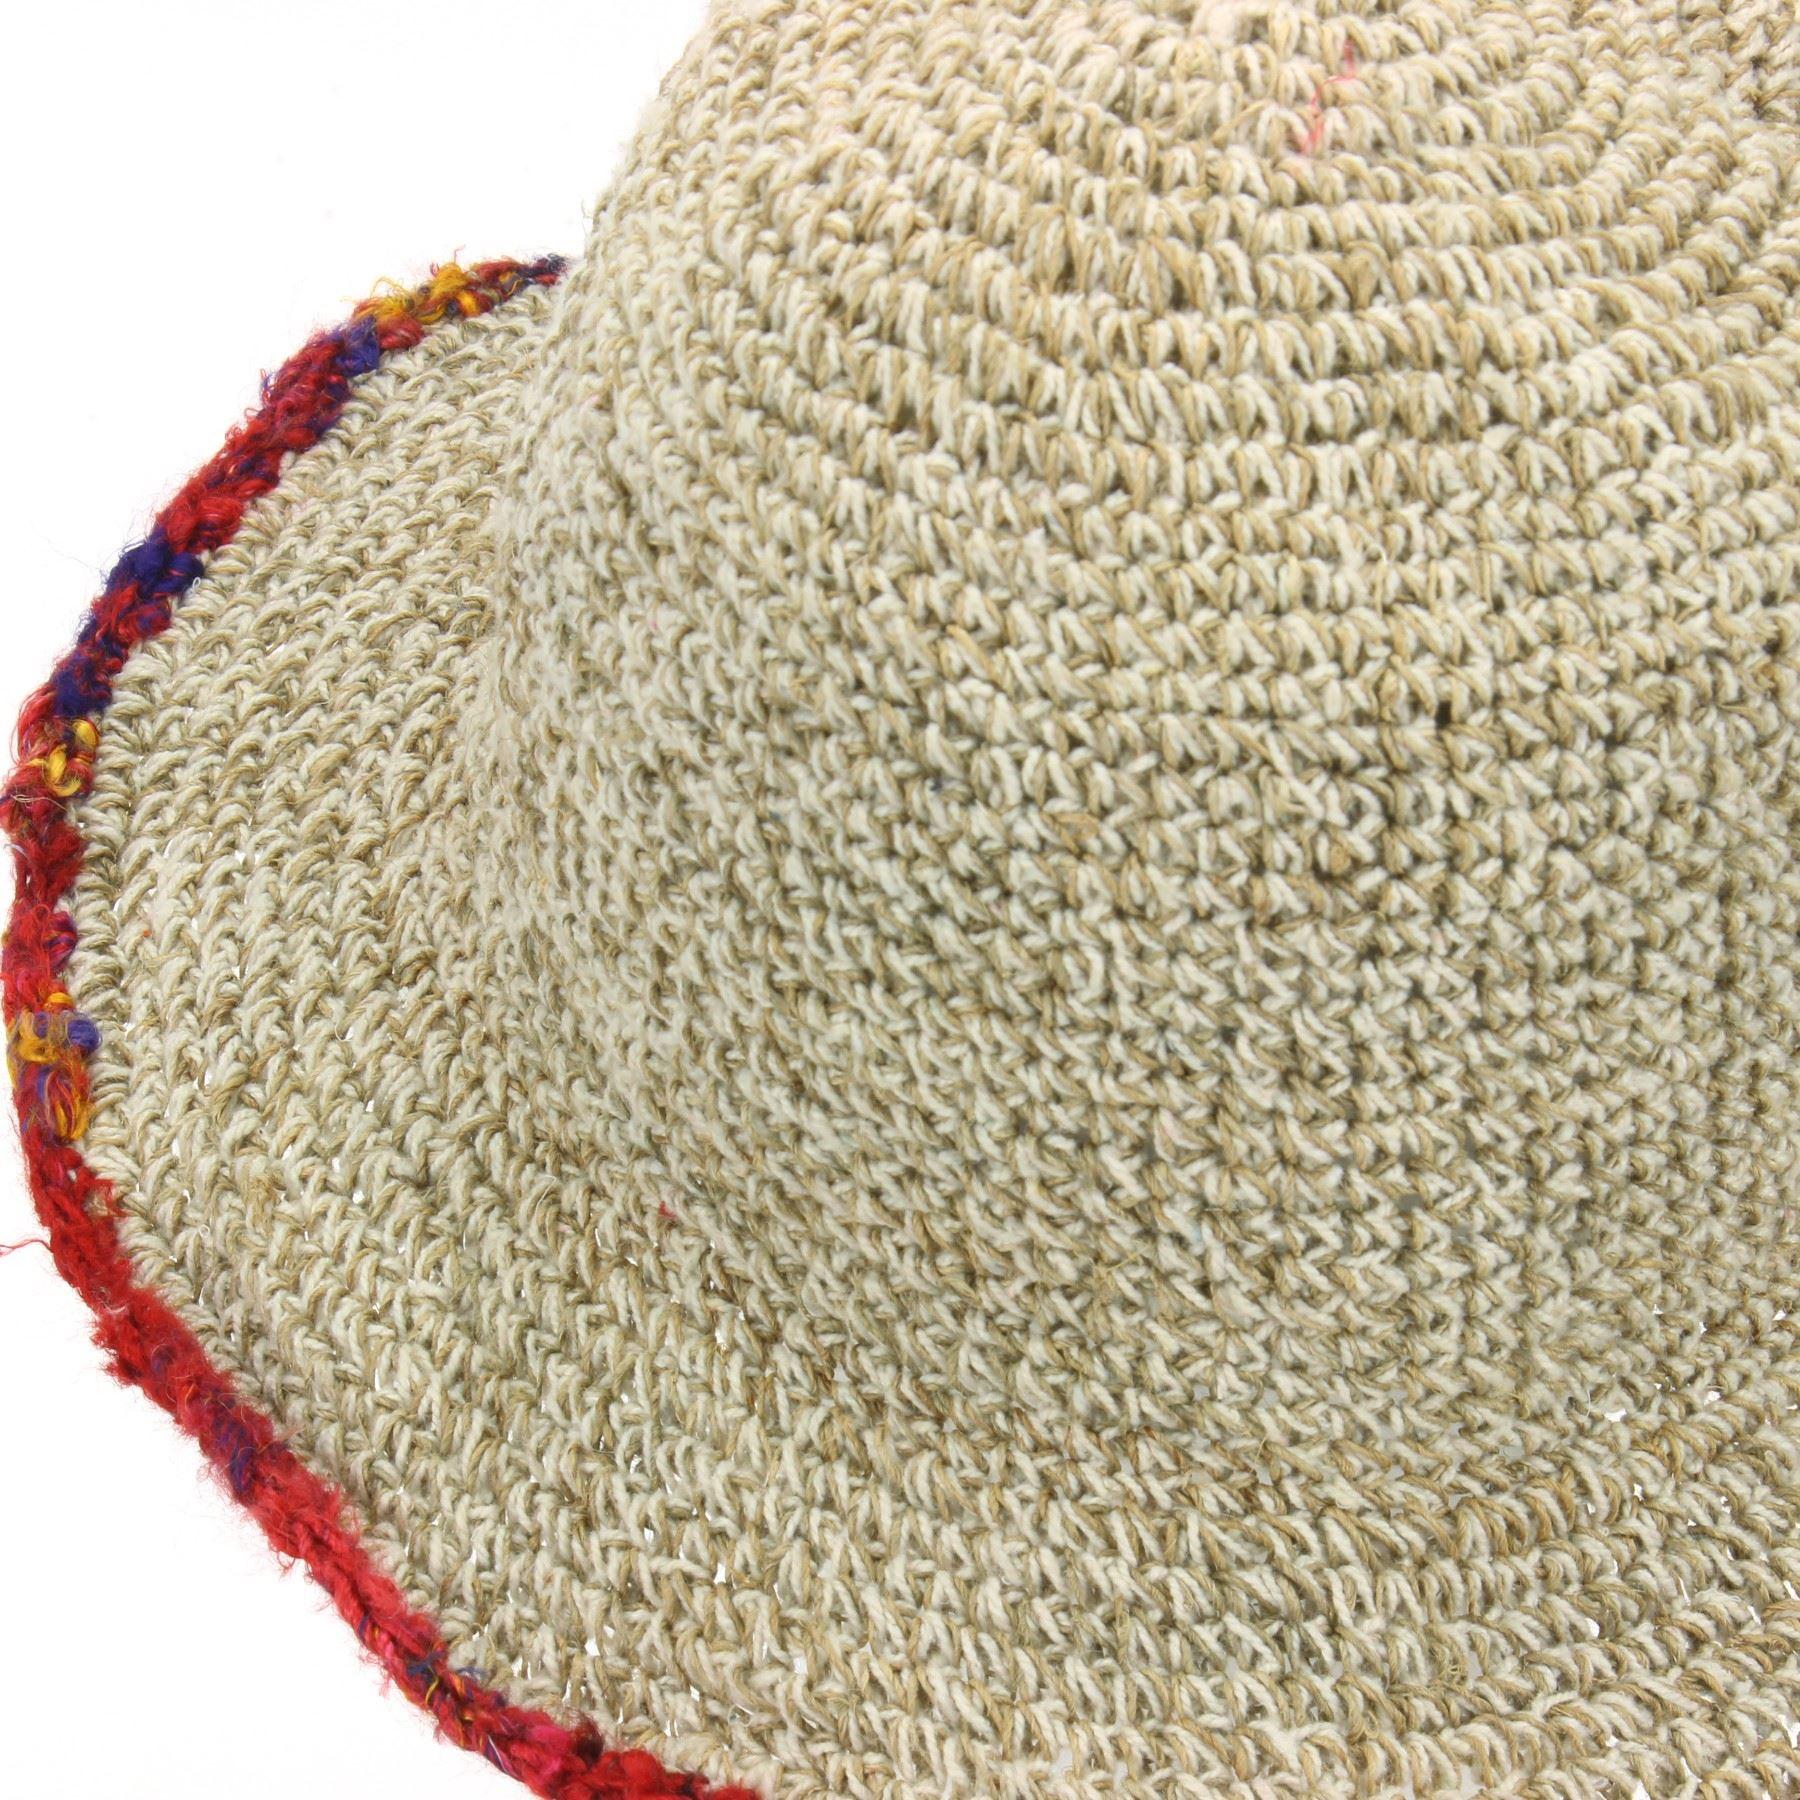 Sun Hat Hemp Cotton Summer LoudElephant Brim Beach Cap Boho Hippie